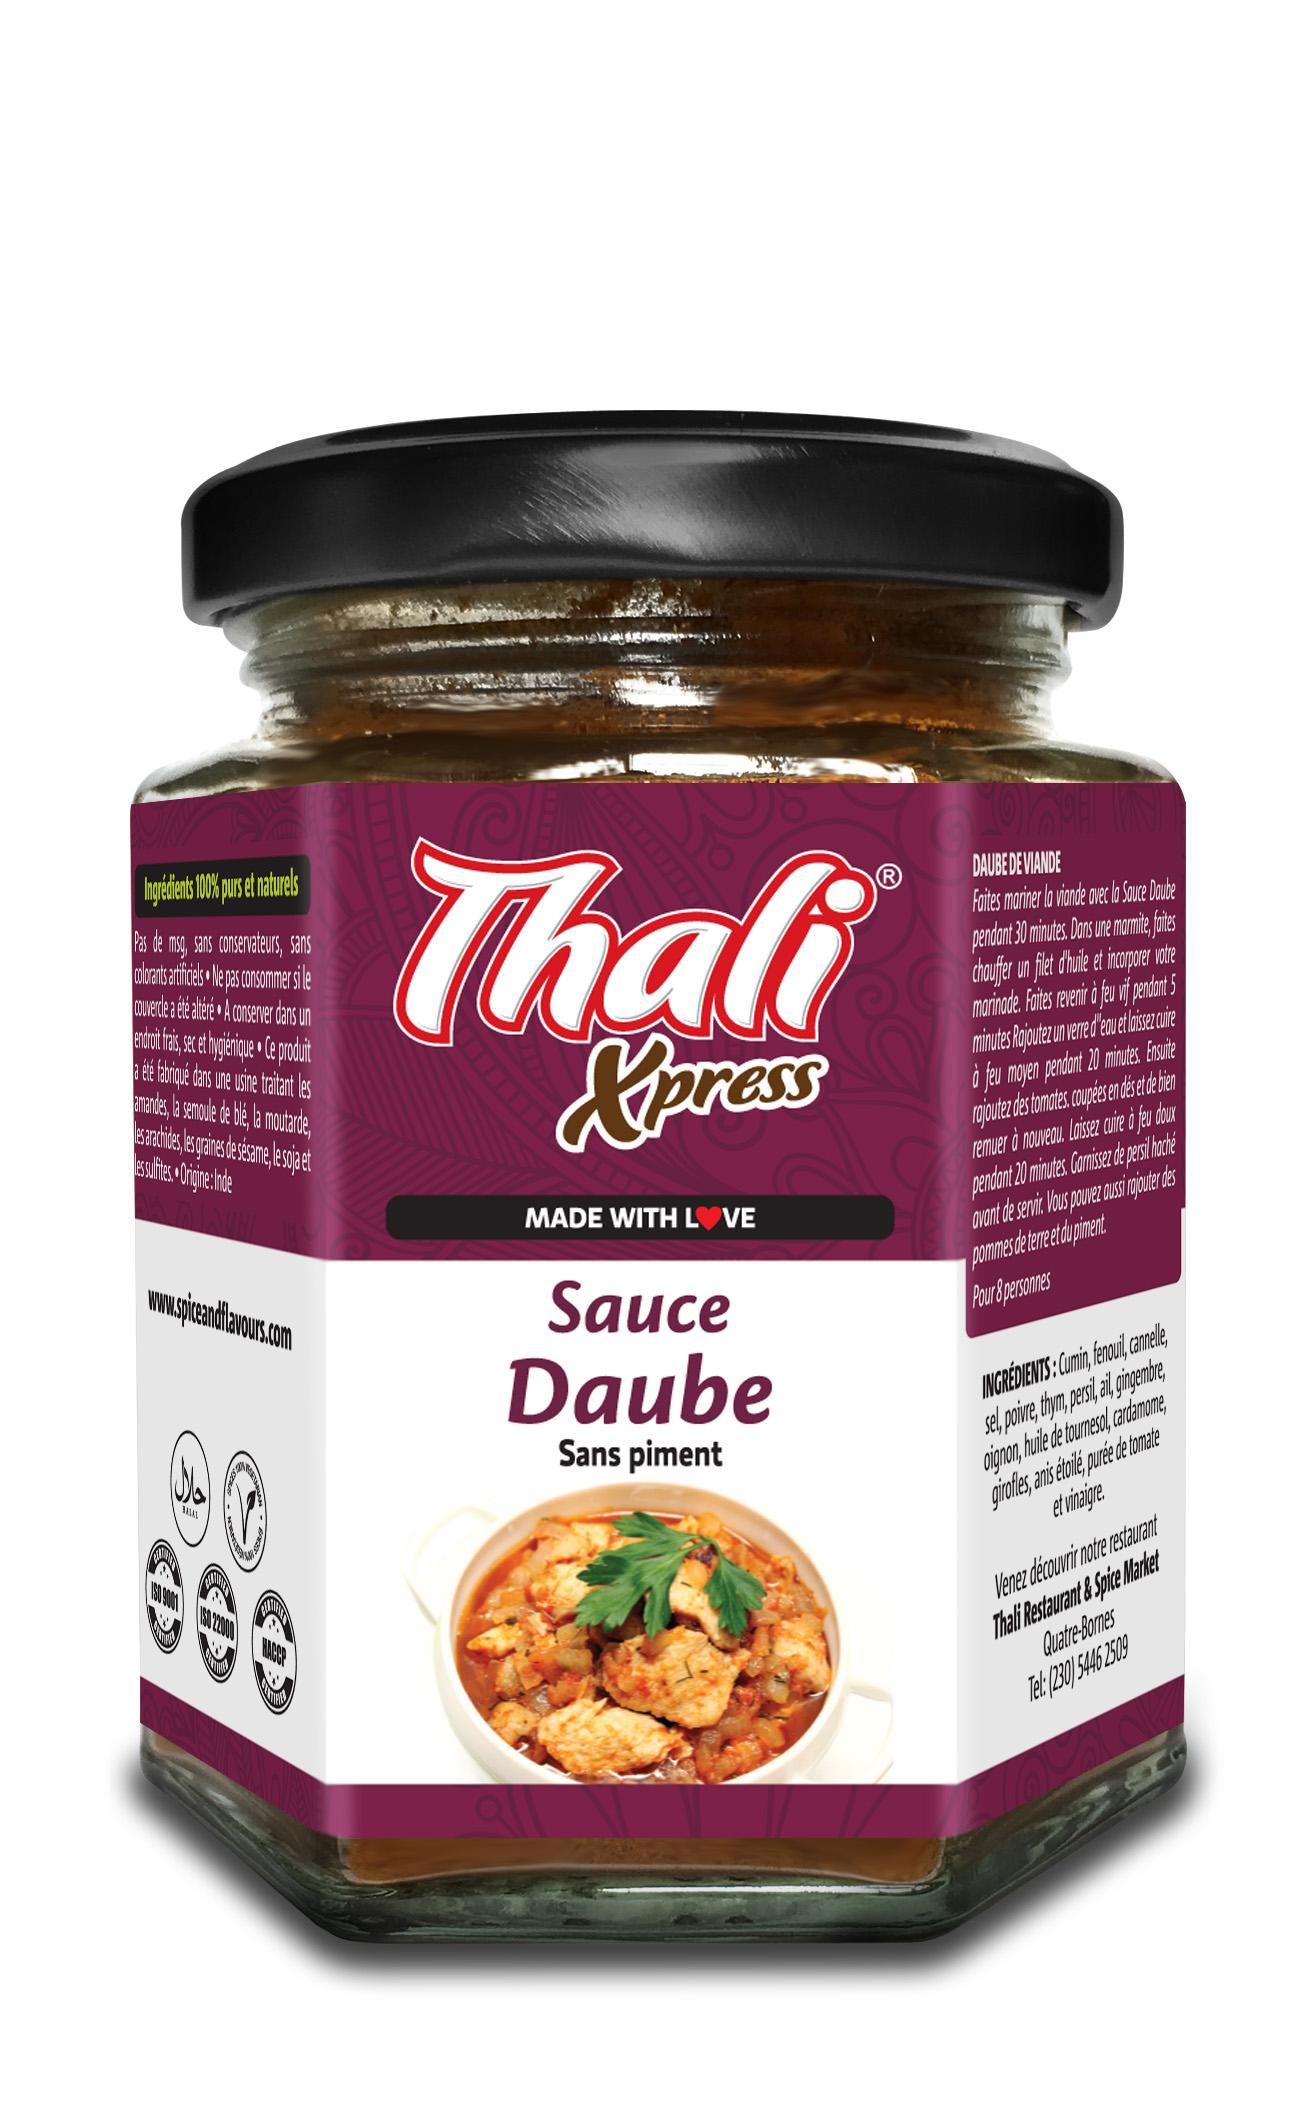 Sauce Daube Image